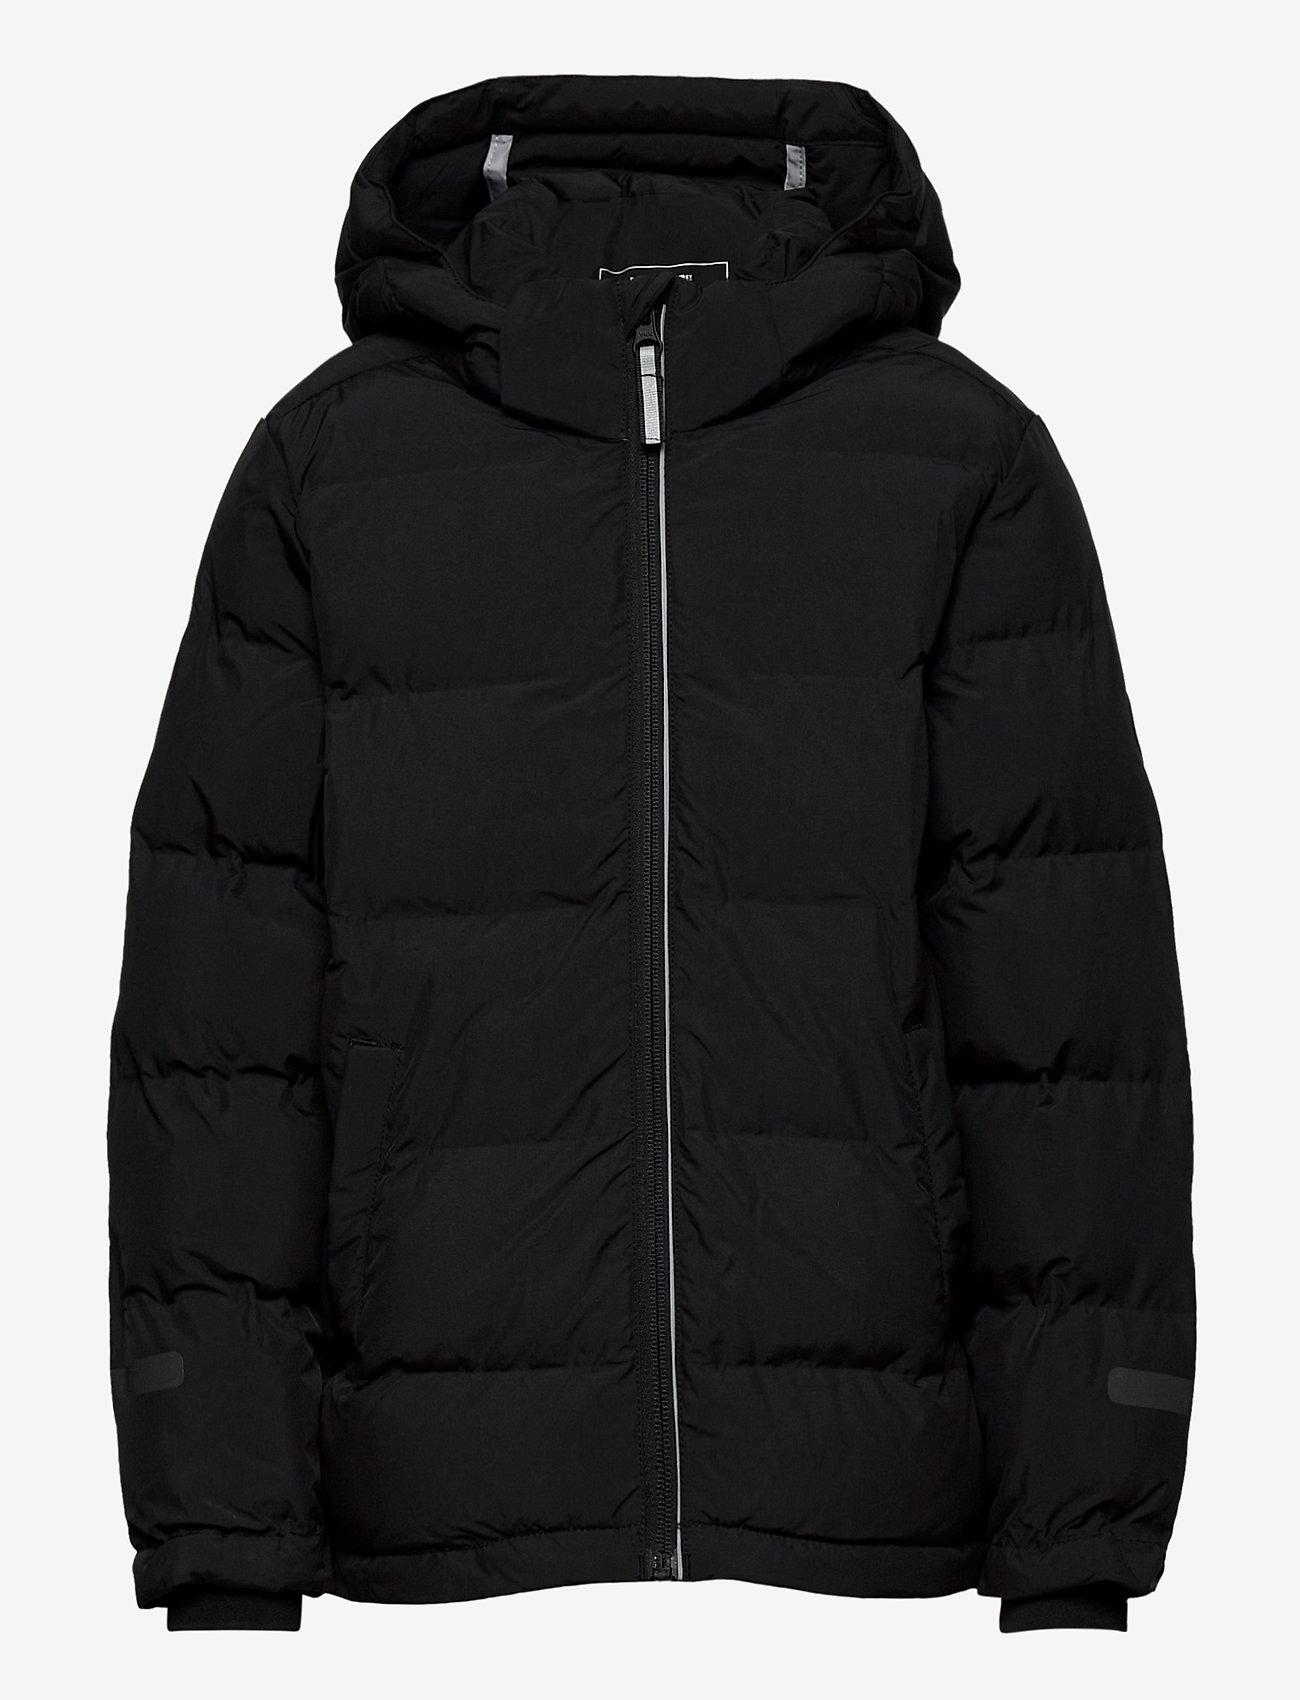 Polarn O. Pyret - Jacket Padded School - gewatteerde jassen - black - 1